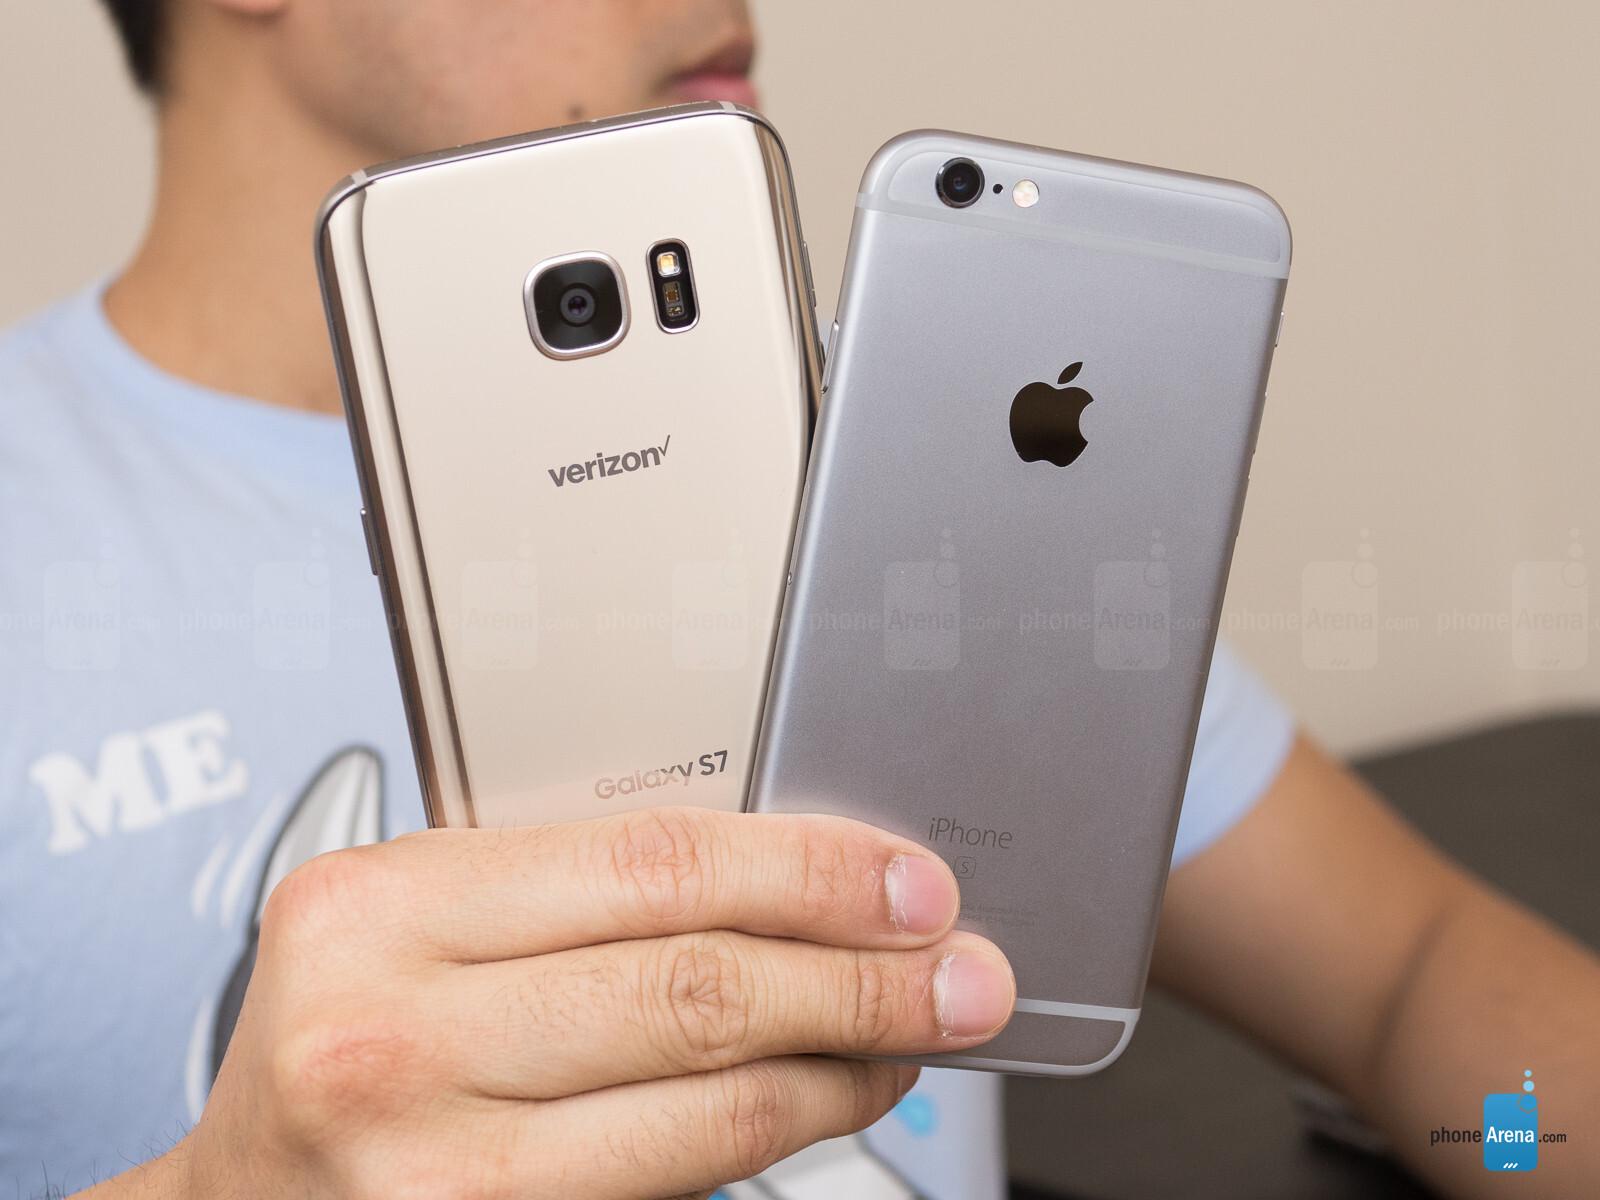 samsung galaxy s7 apple iphone 6